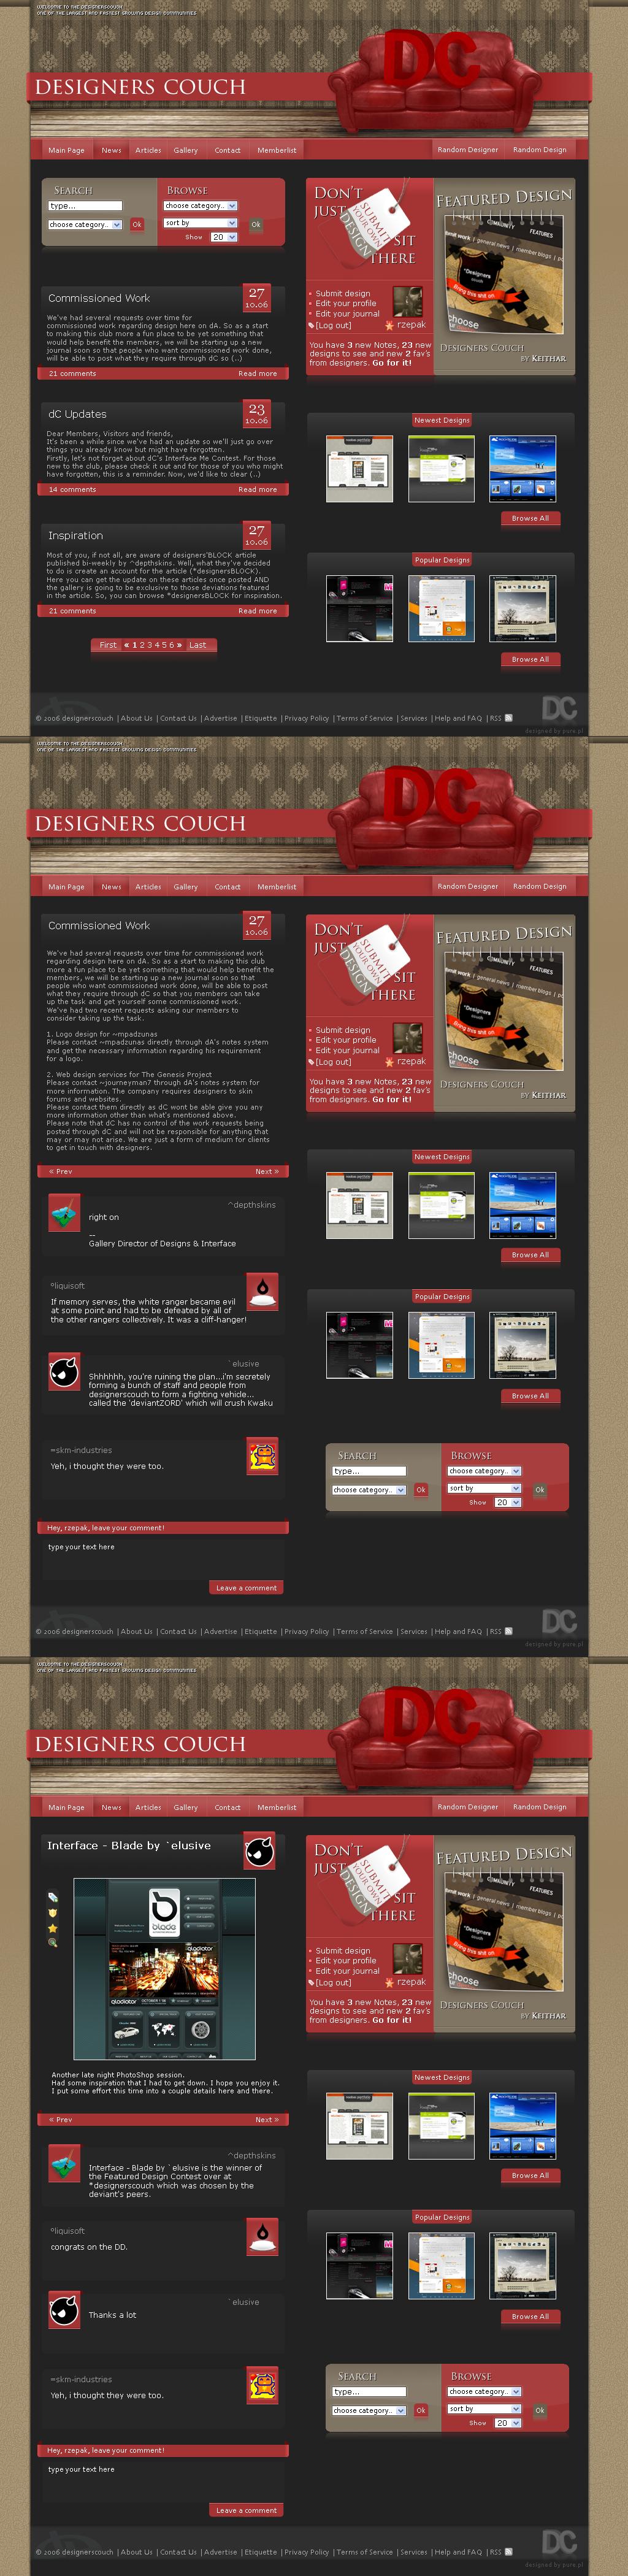 Interface me contest by rzepak